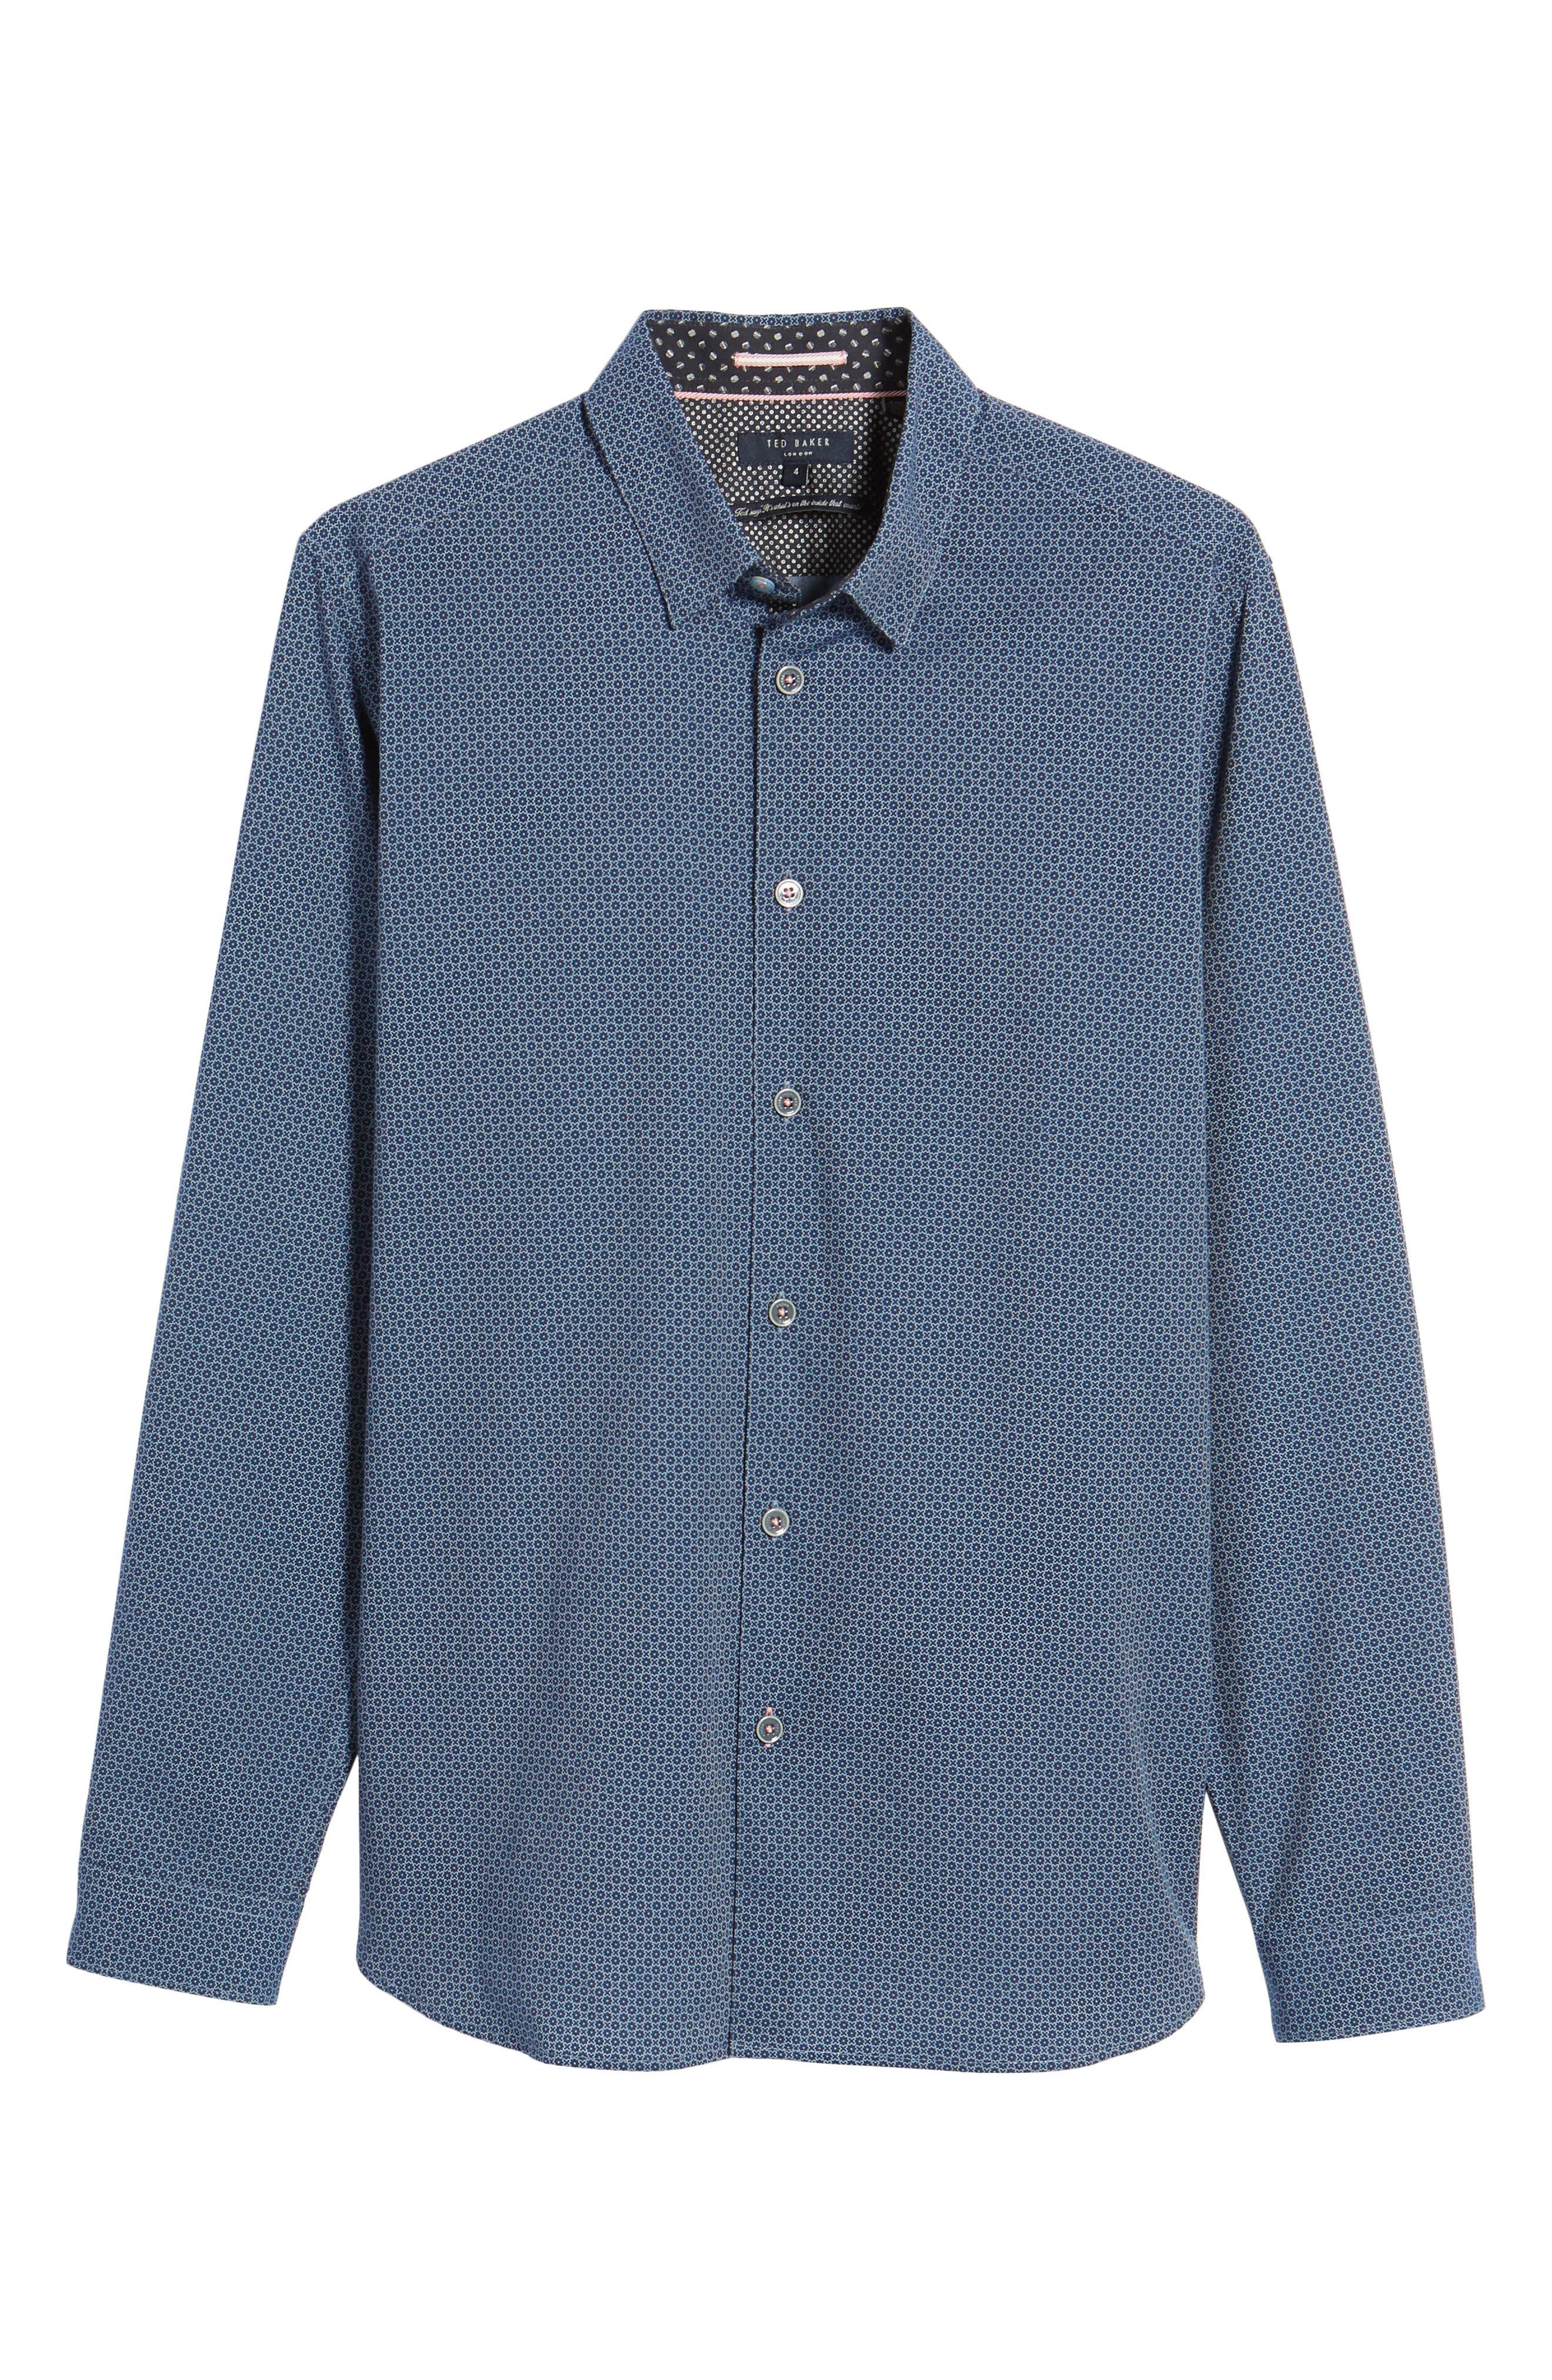 Holic Trim Fit Geometric Sport Shirt,                             Alternate thumbnail 6, color,                             Blue